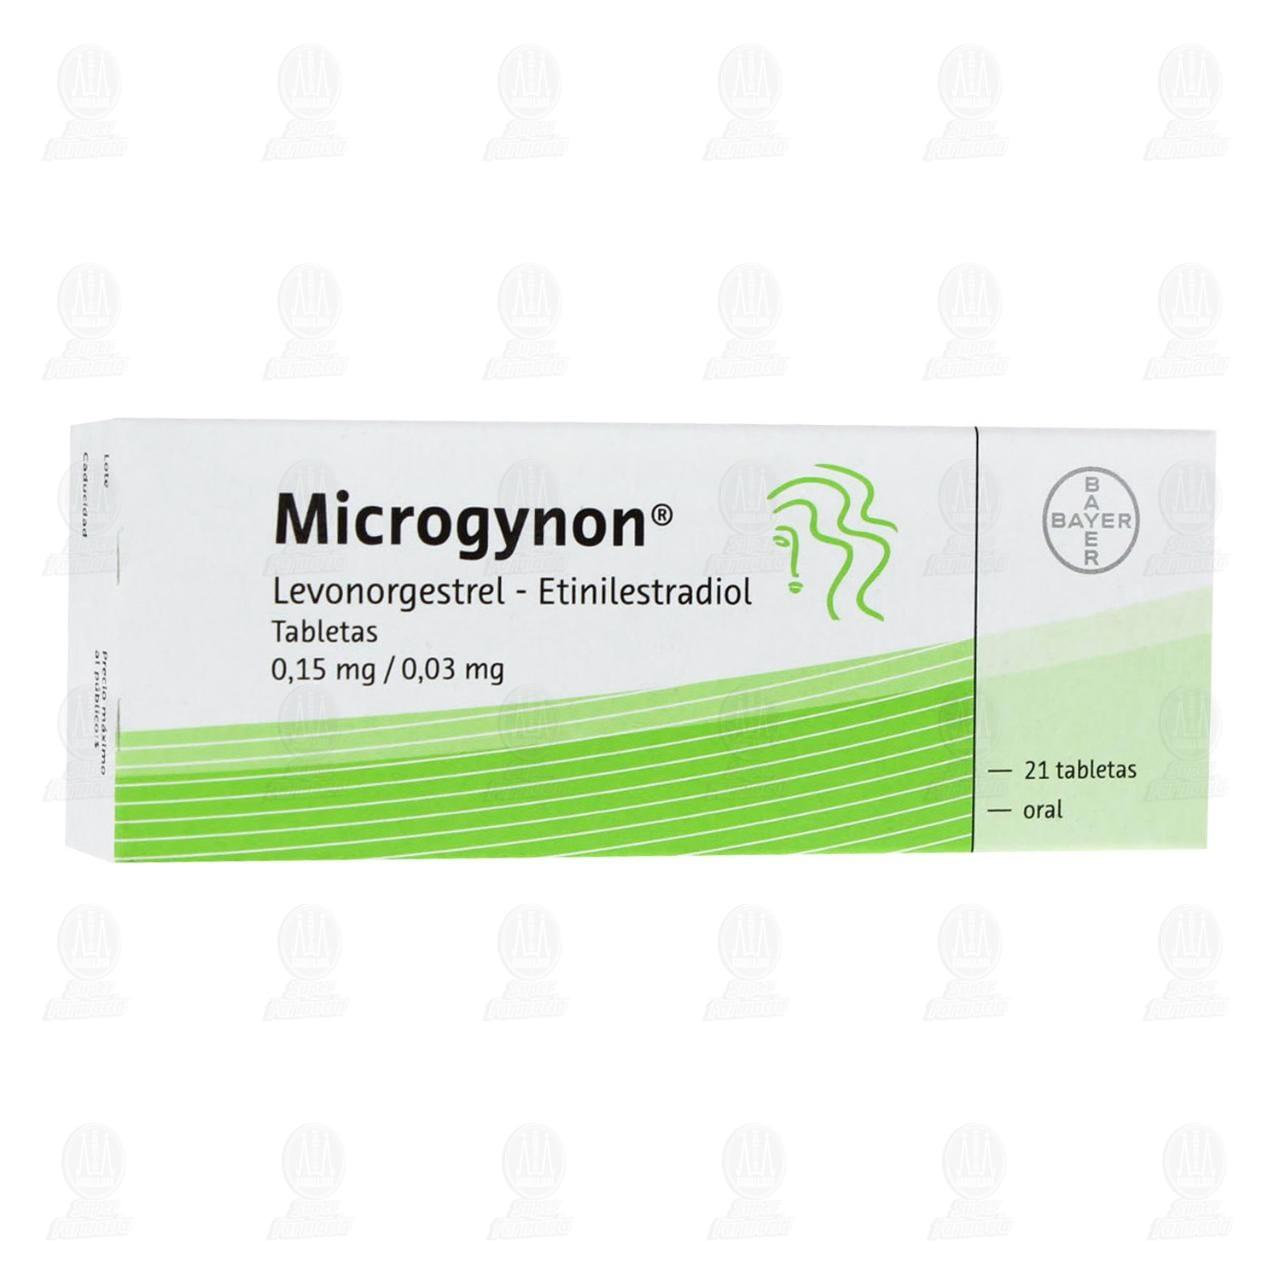 Comprar Microgynon 0.15mg/0.03mg 21 Tabletas en Farmacias Guadalajara